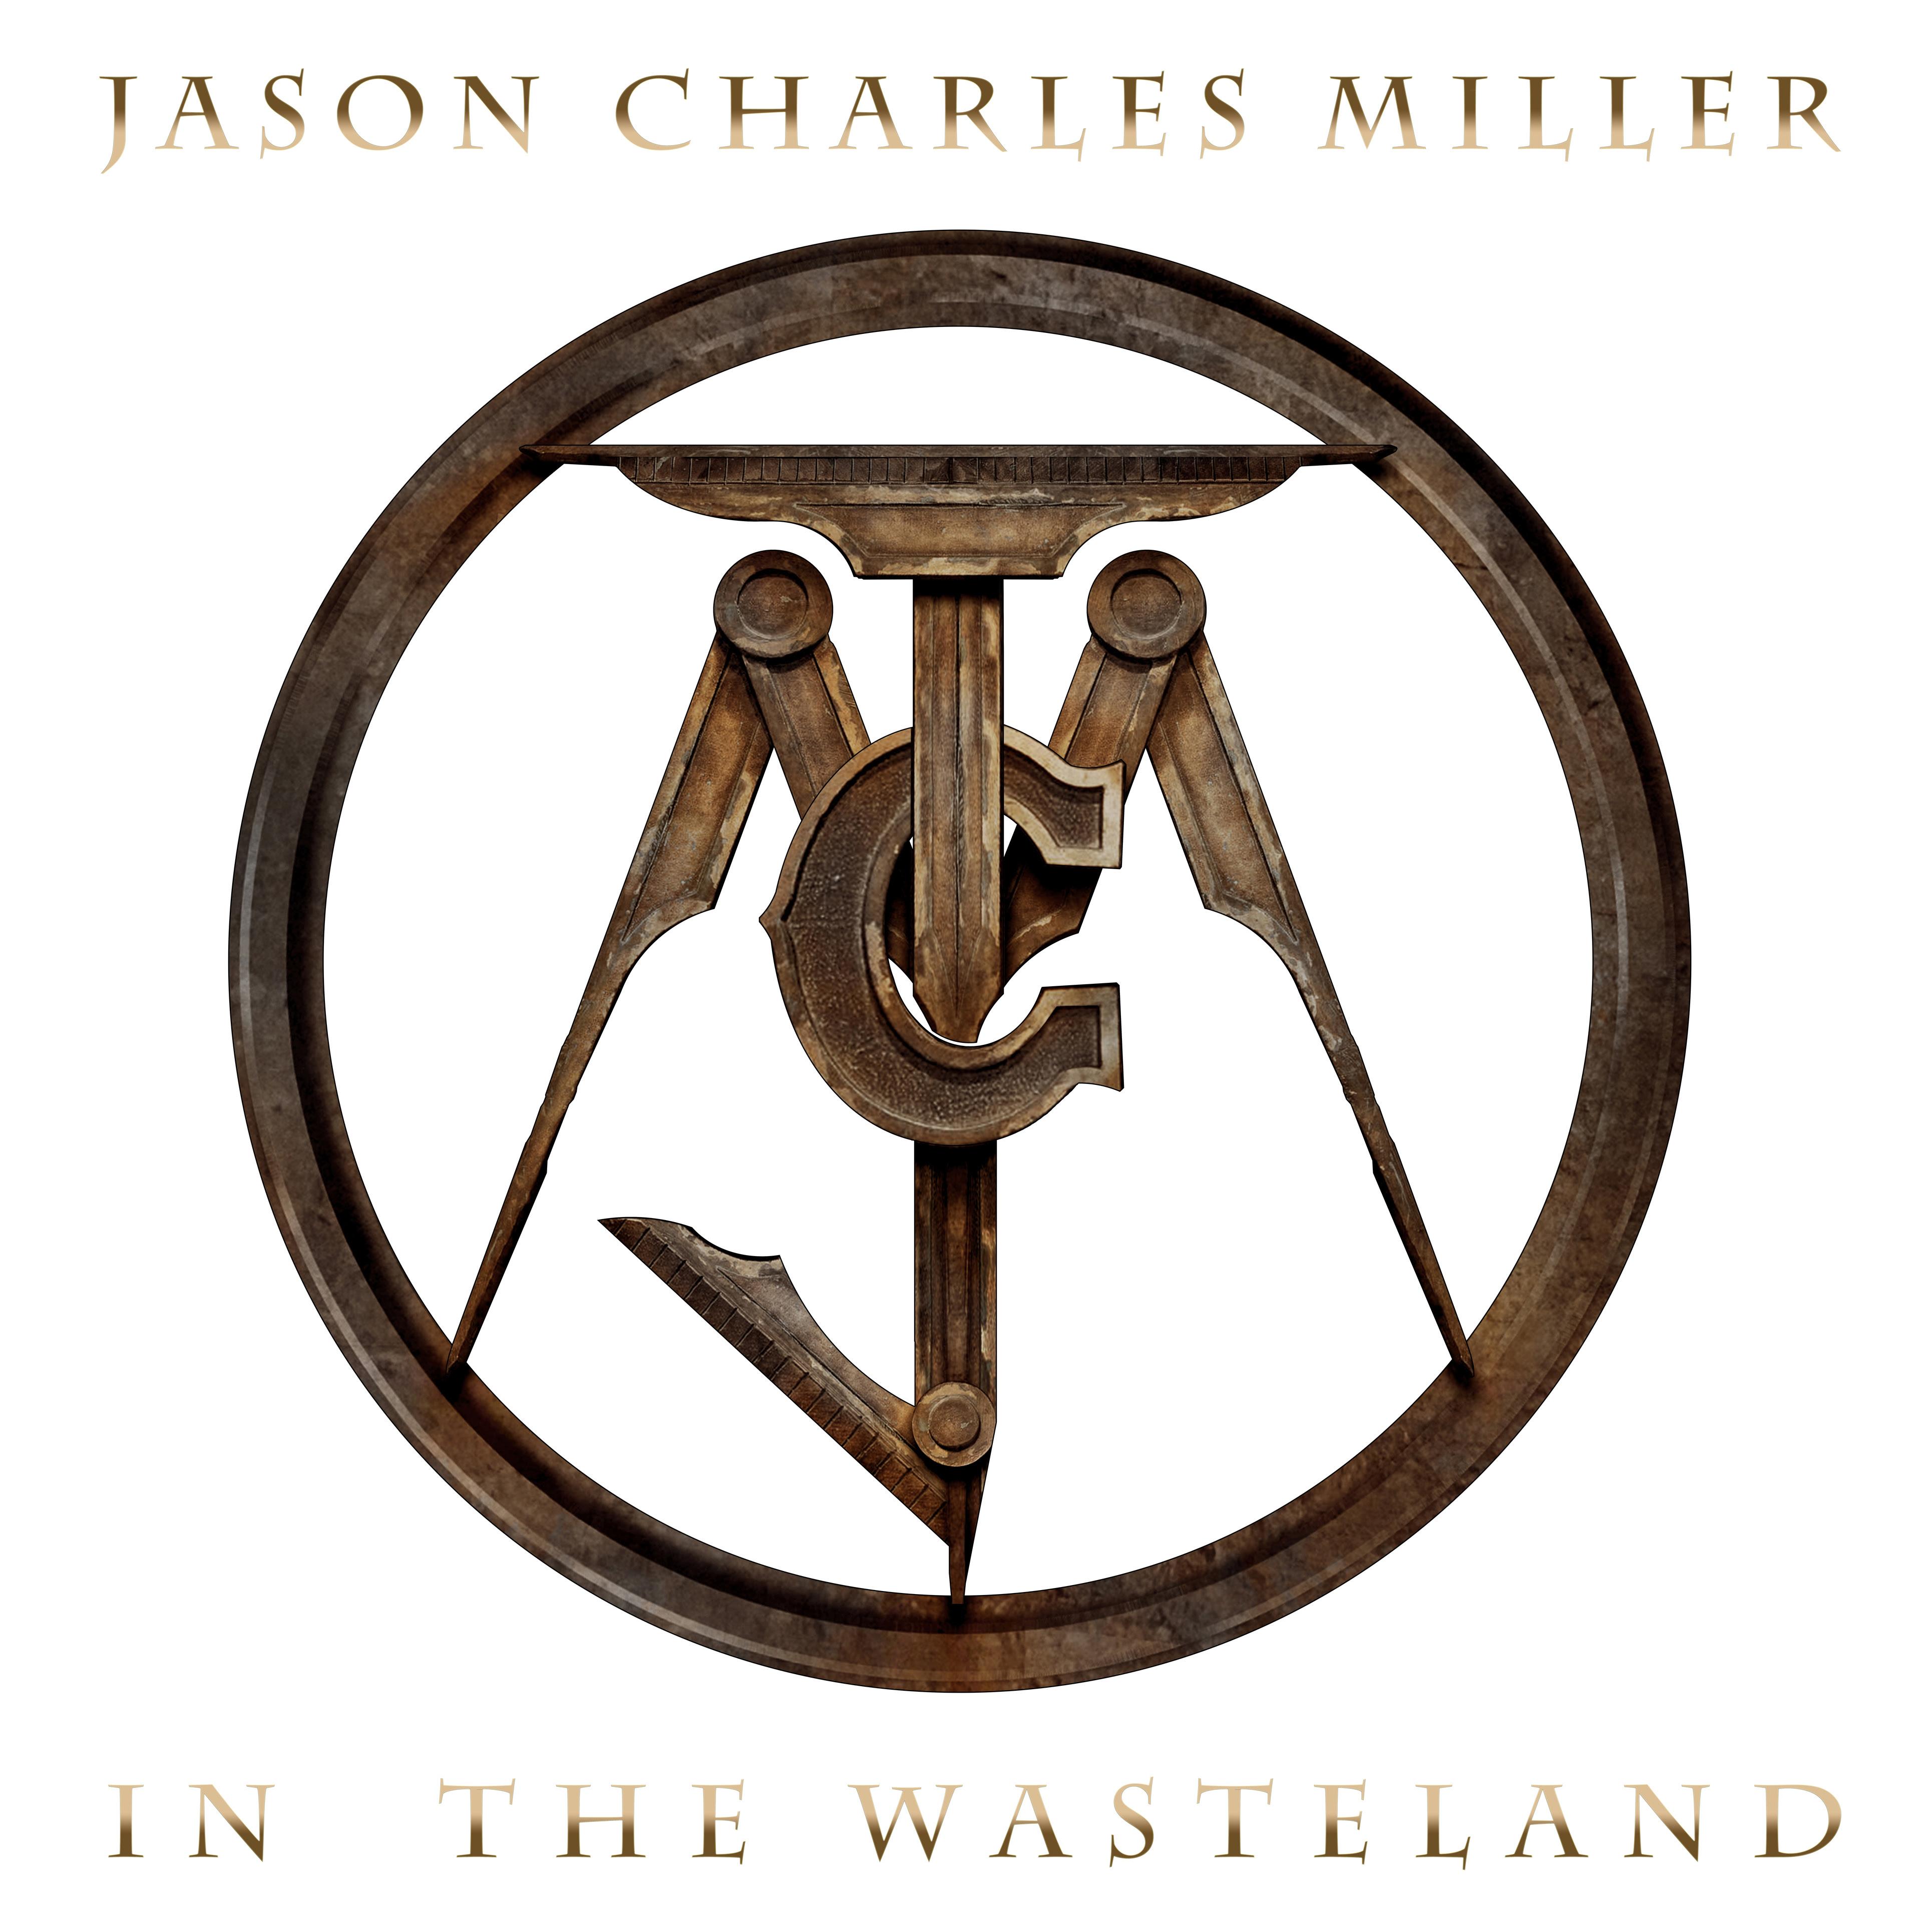 Jason-Charles-Miller-In-The-Wasteland.jpeg